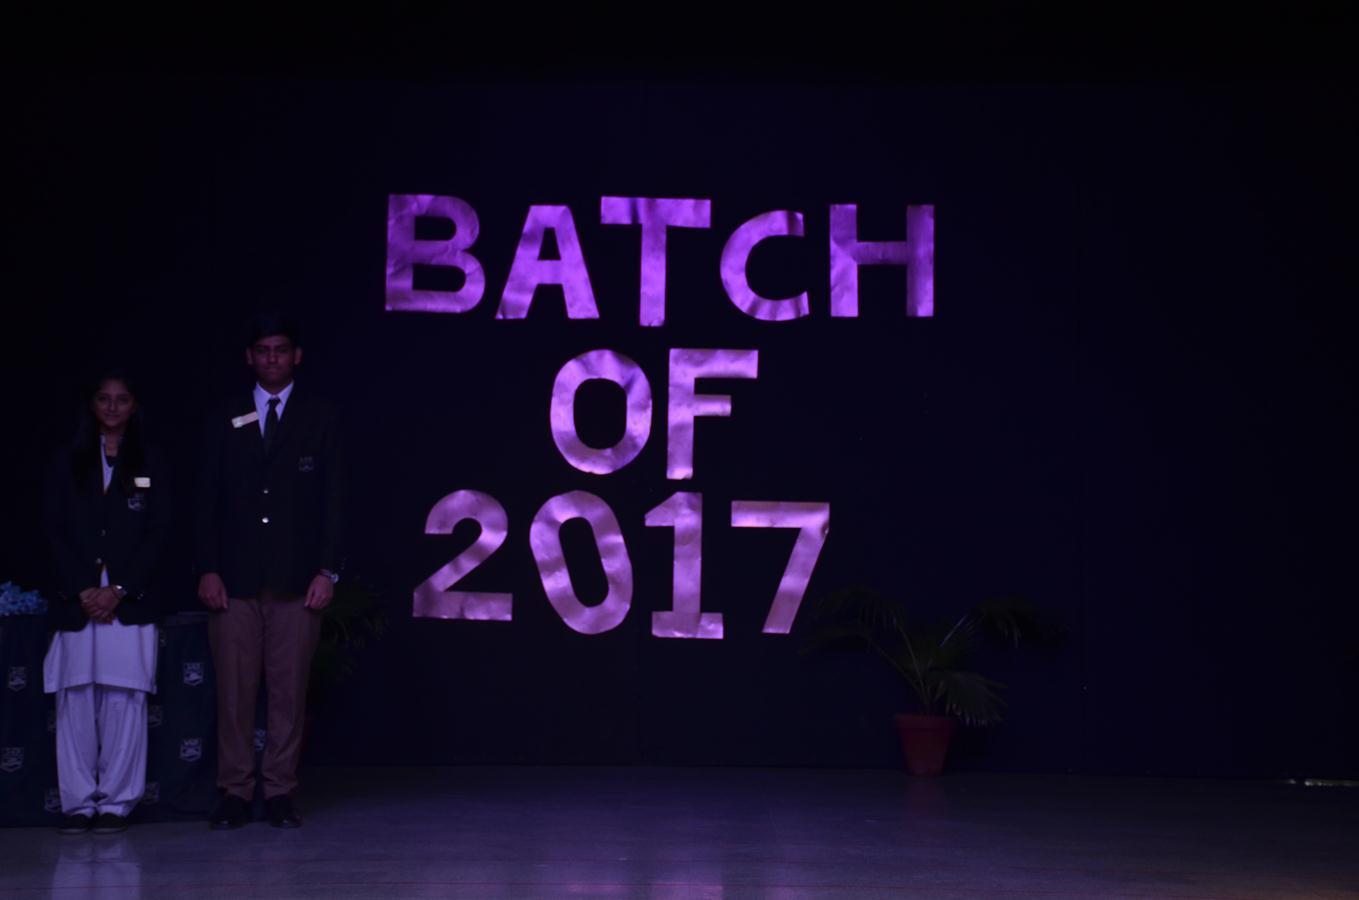 A level Graduation Ceremony (Batch of 2017)